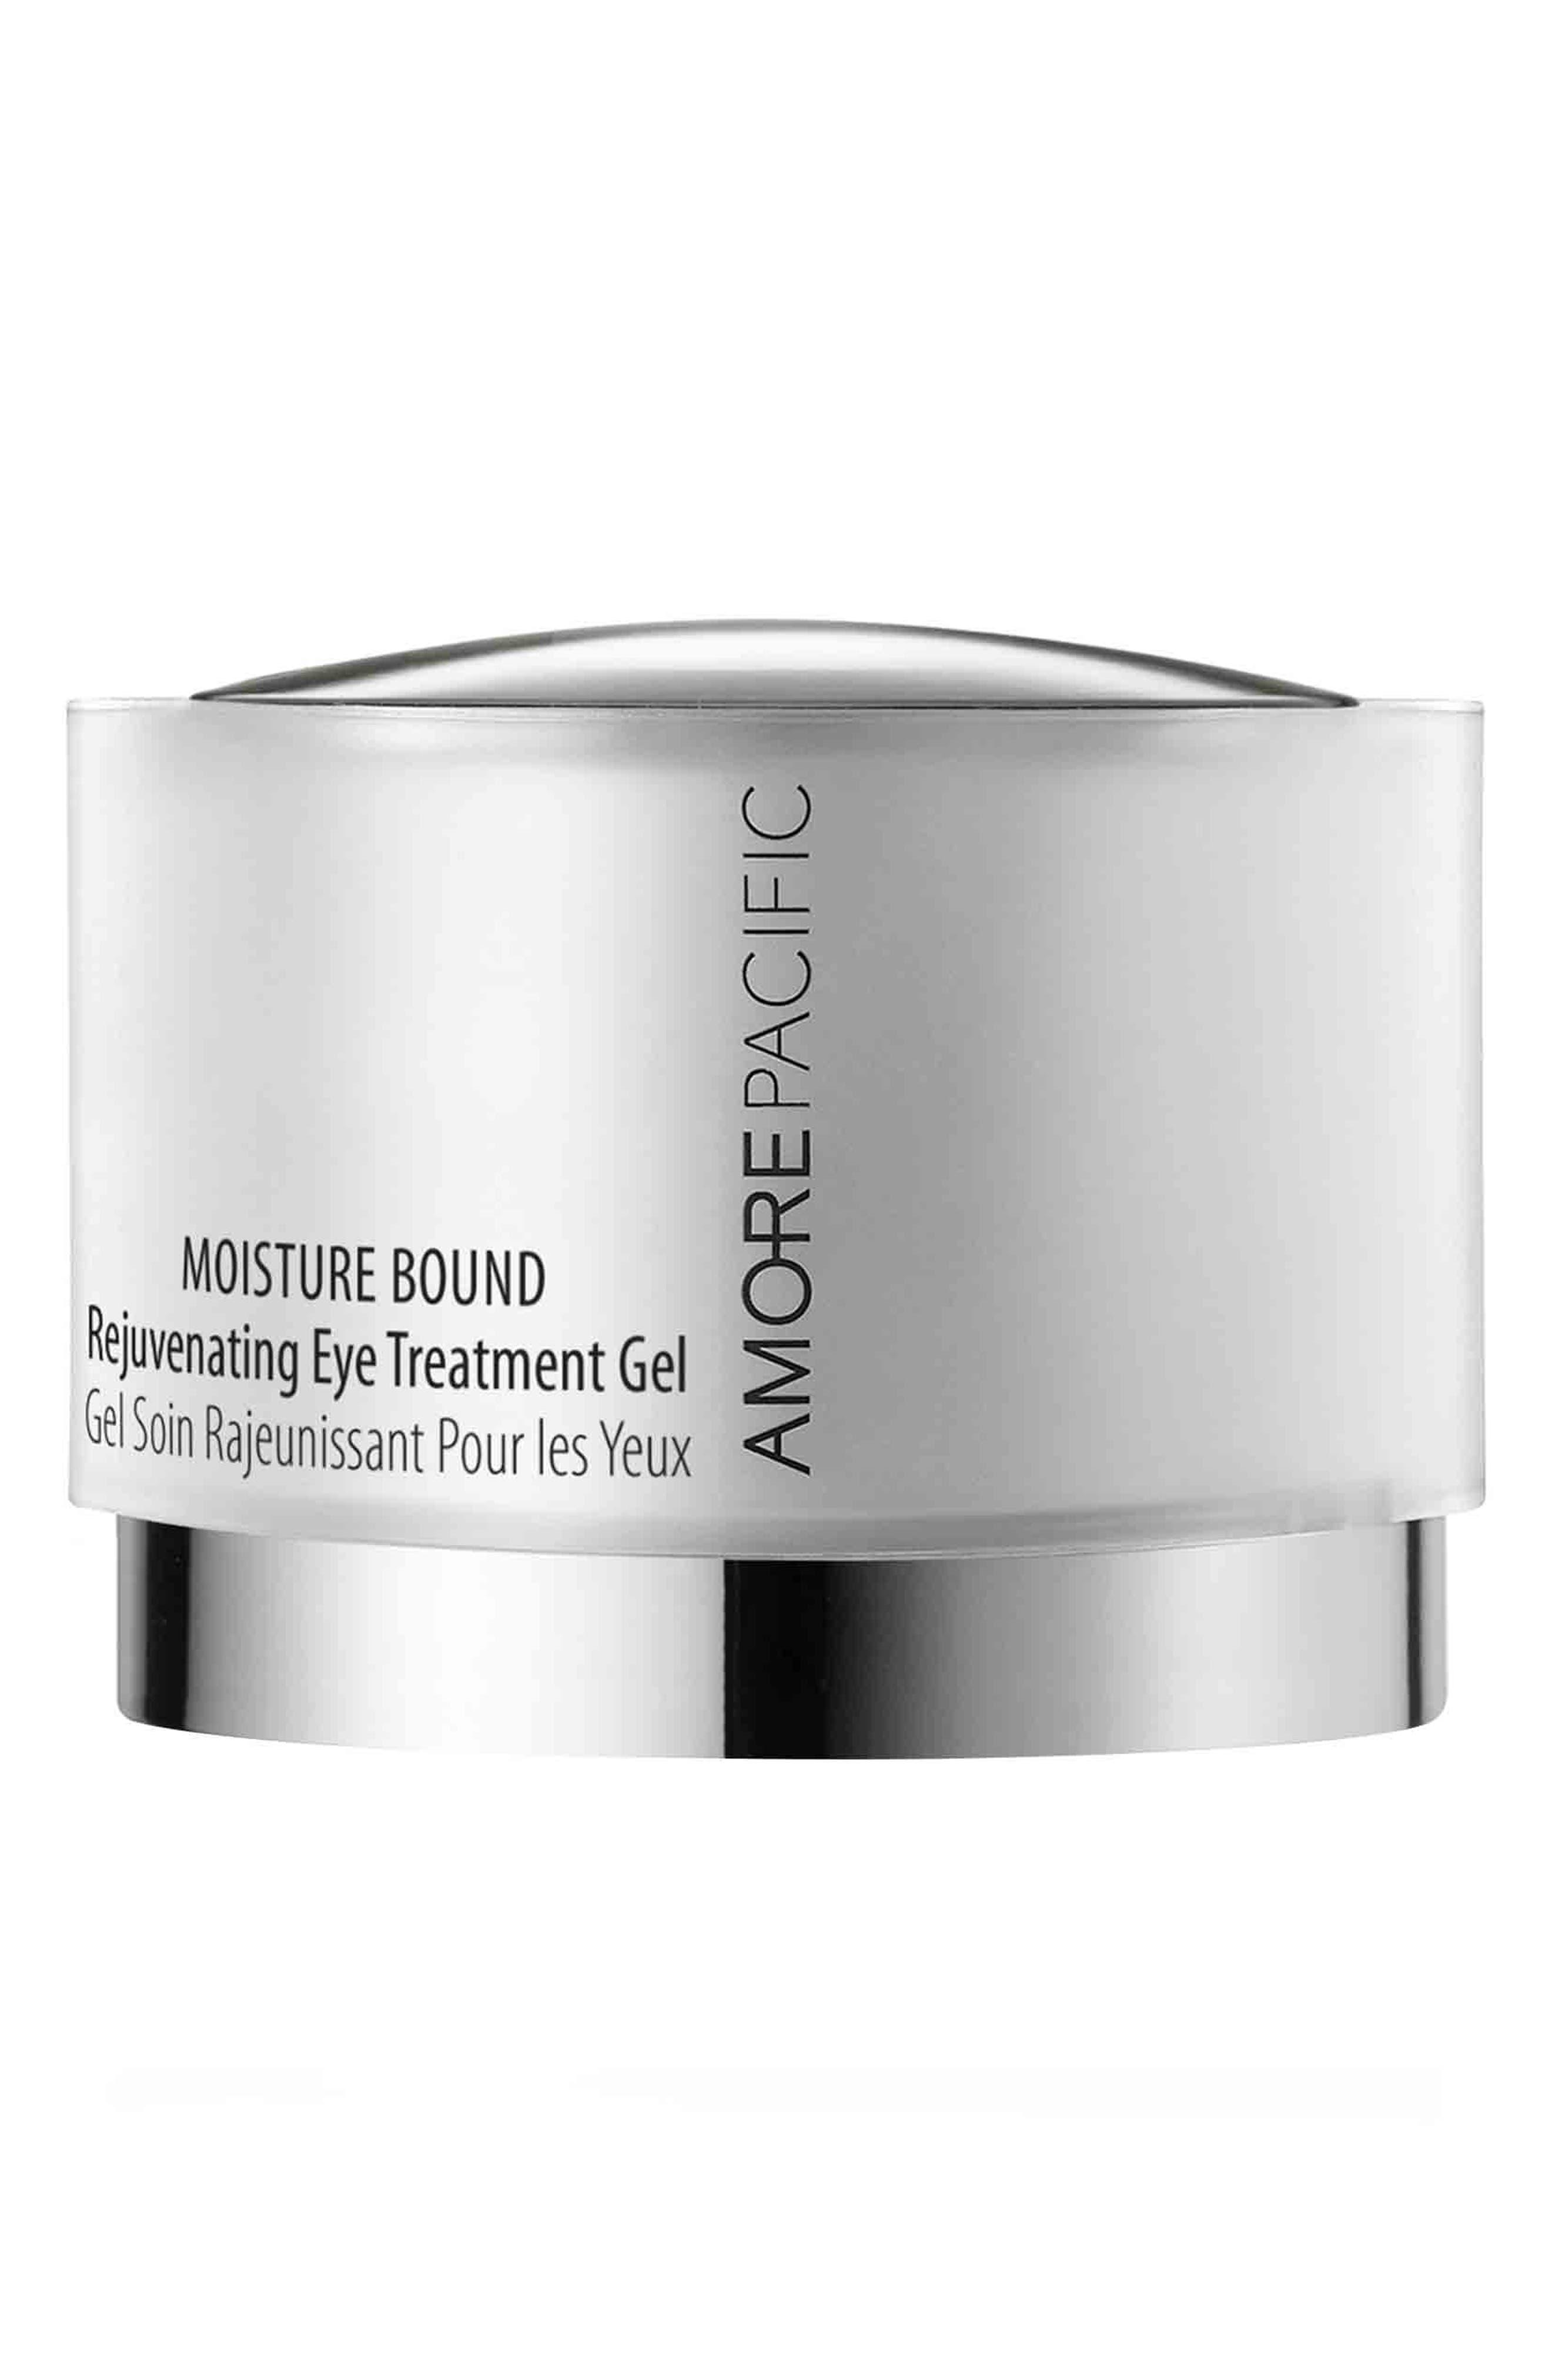 Moisture Bound Rejuvenating Eye Treatment Gel